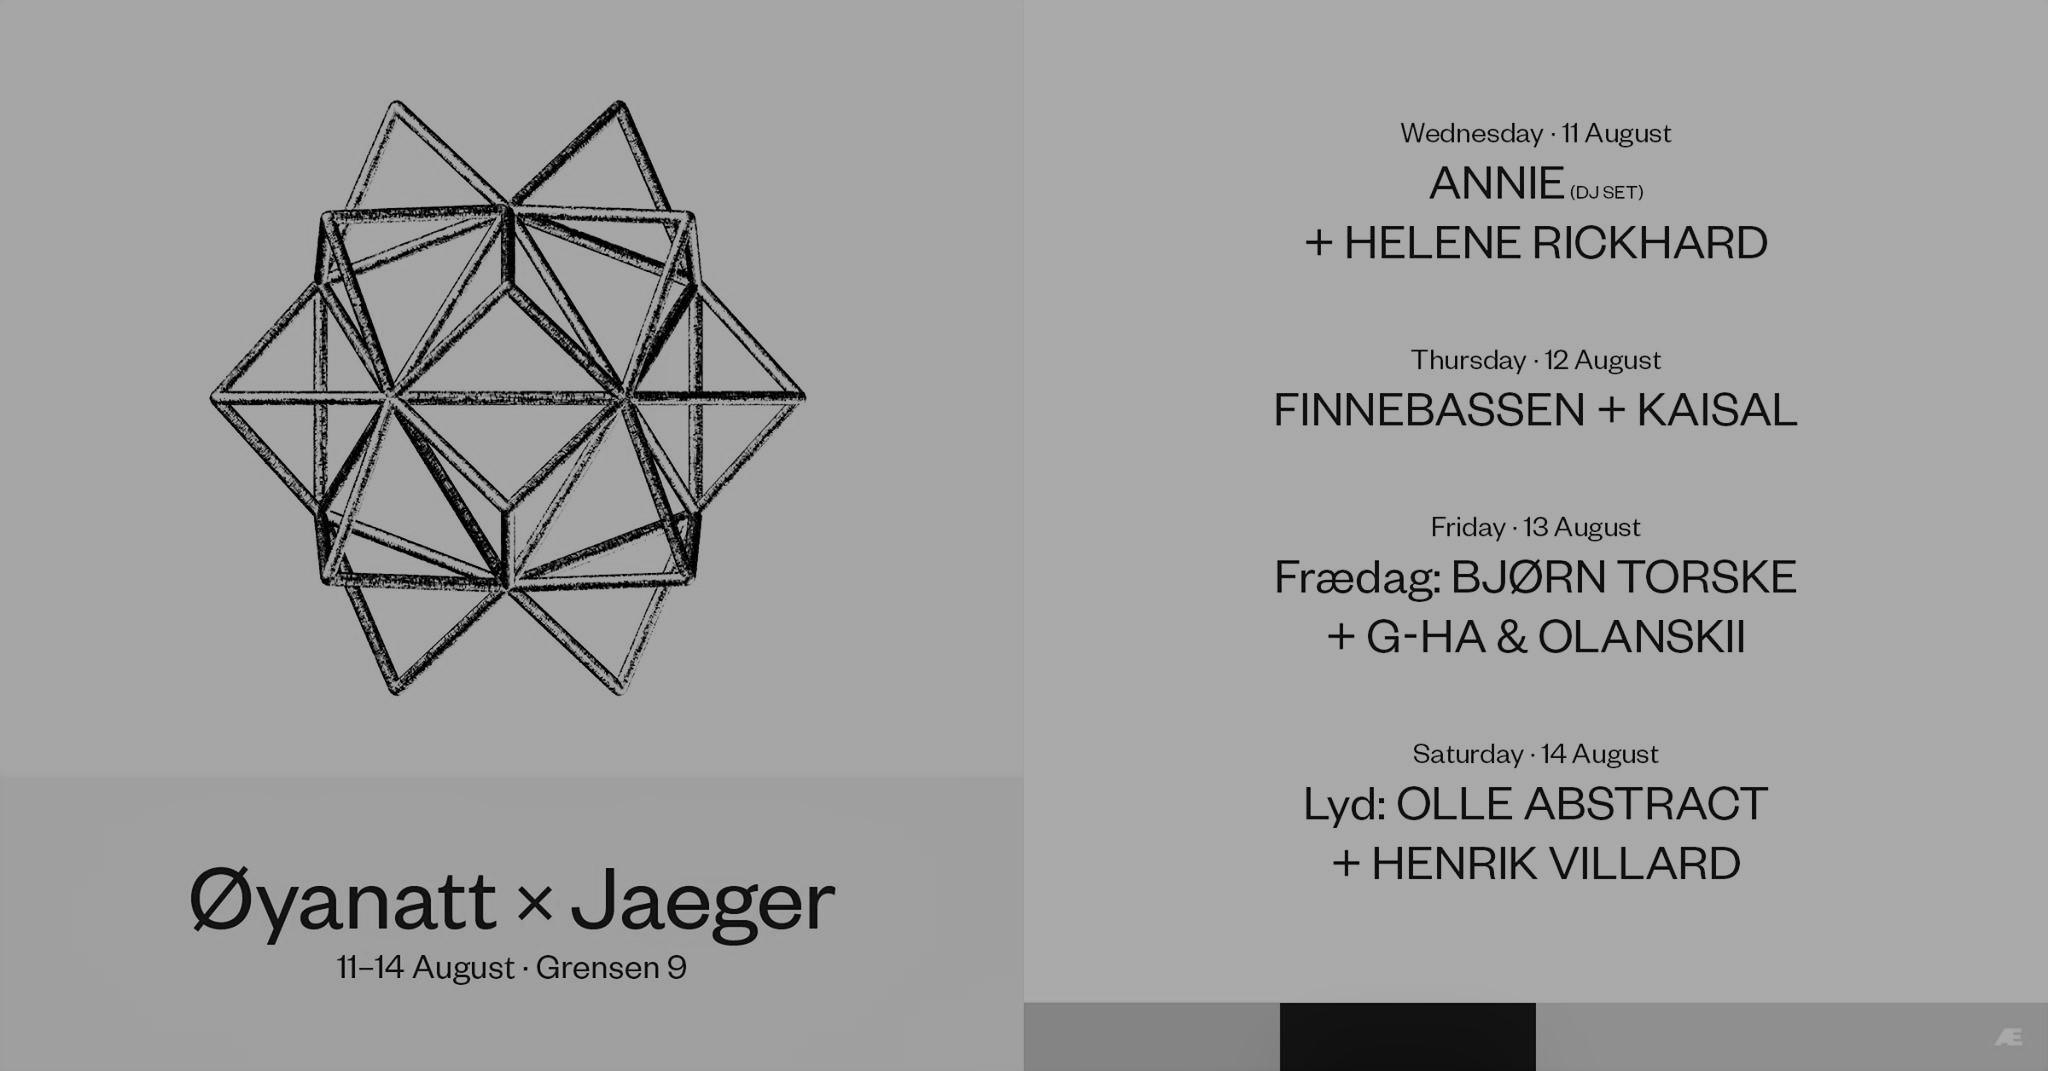 jaeger (2)